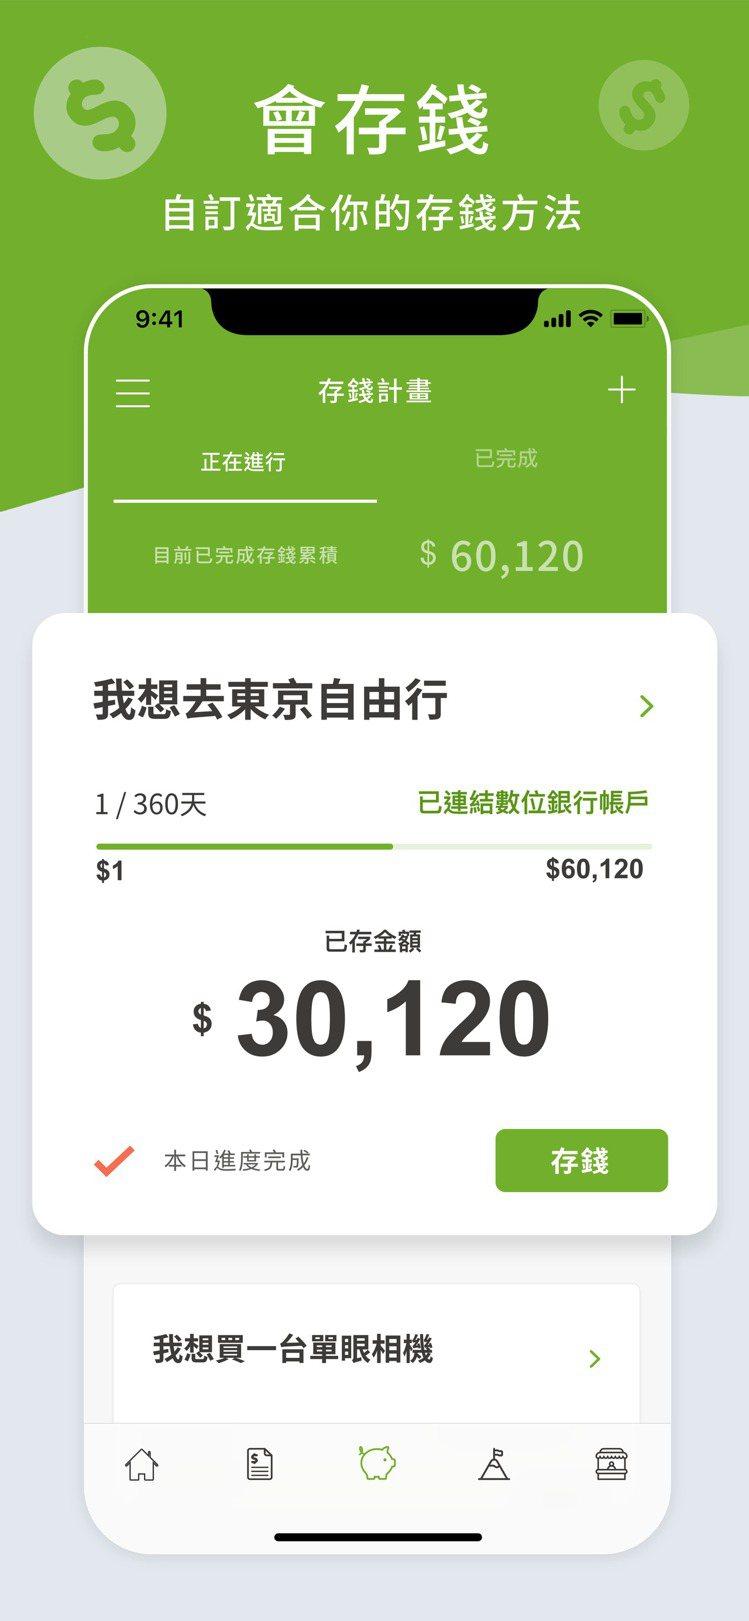 「friDay 57」App的「會存錢」功能可建立多個存錢夢想計畫,透過App檢...